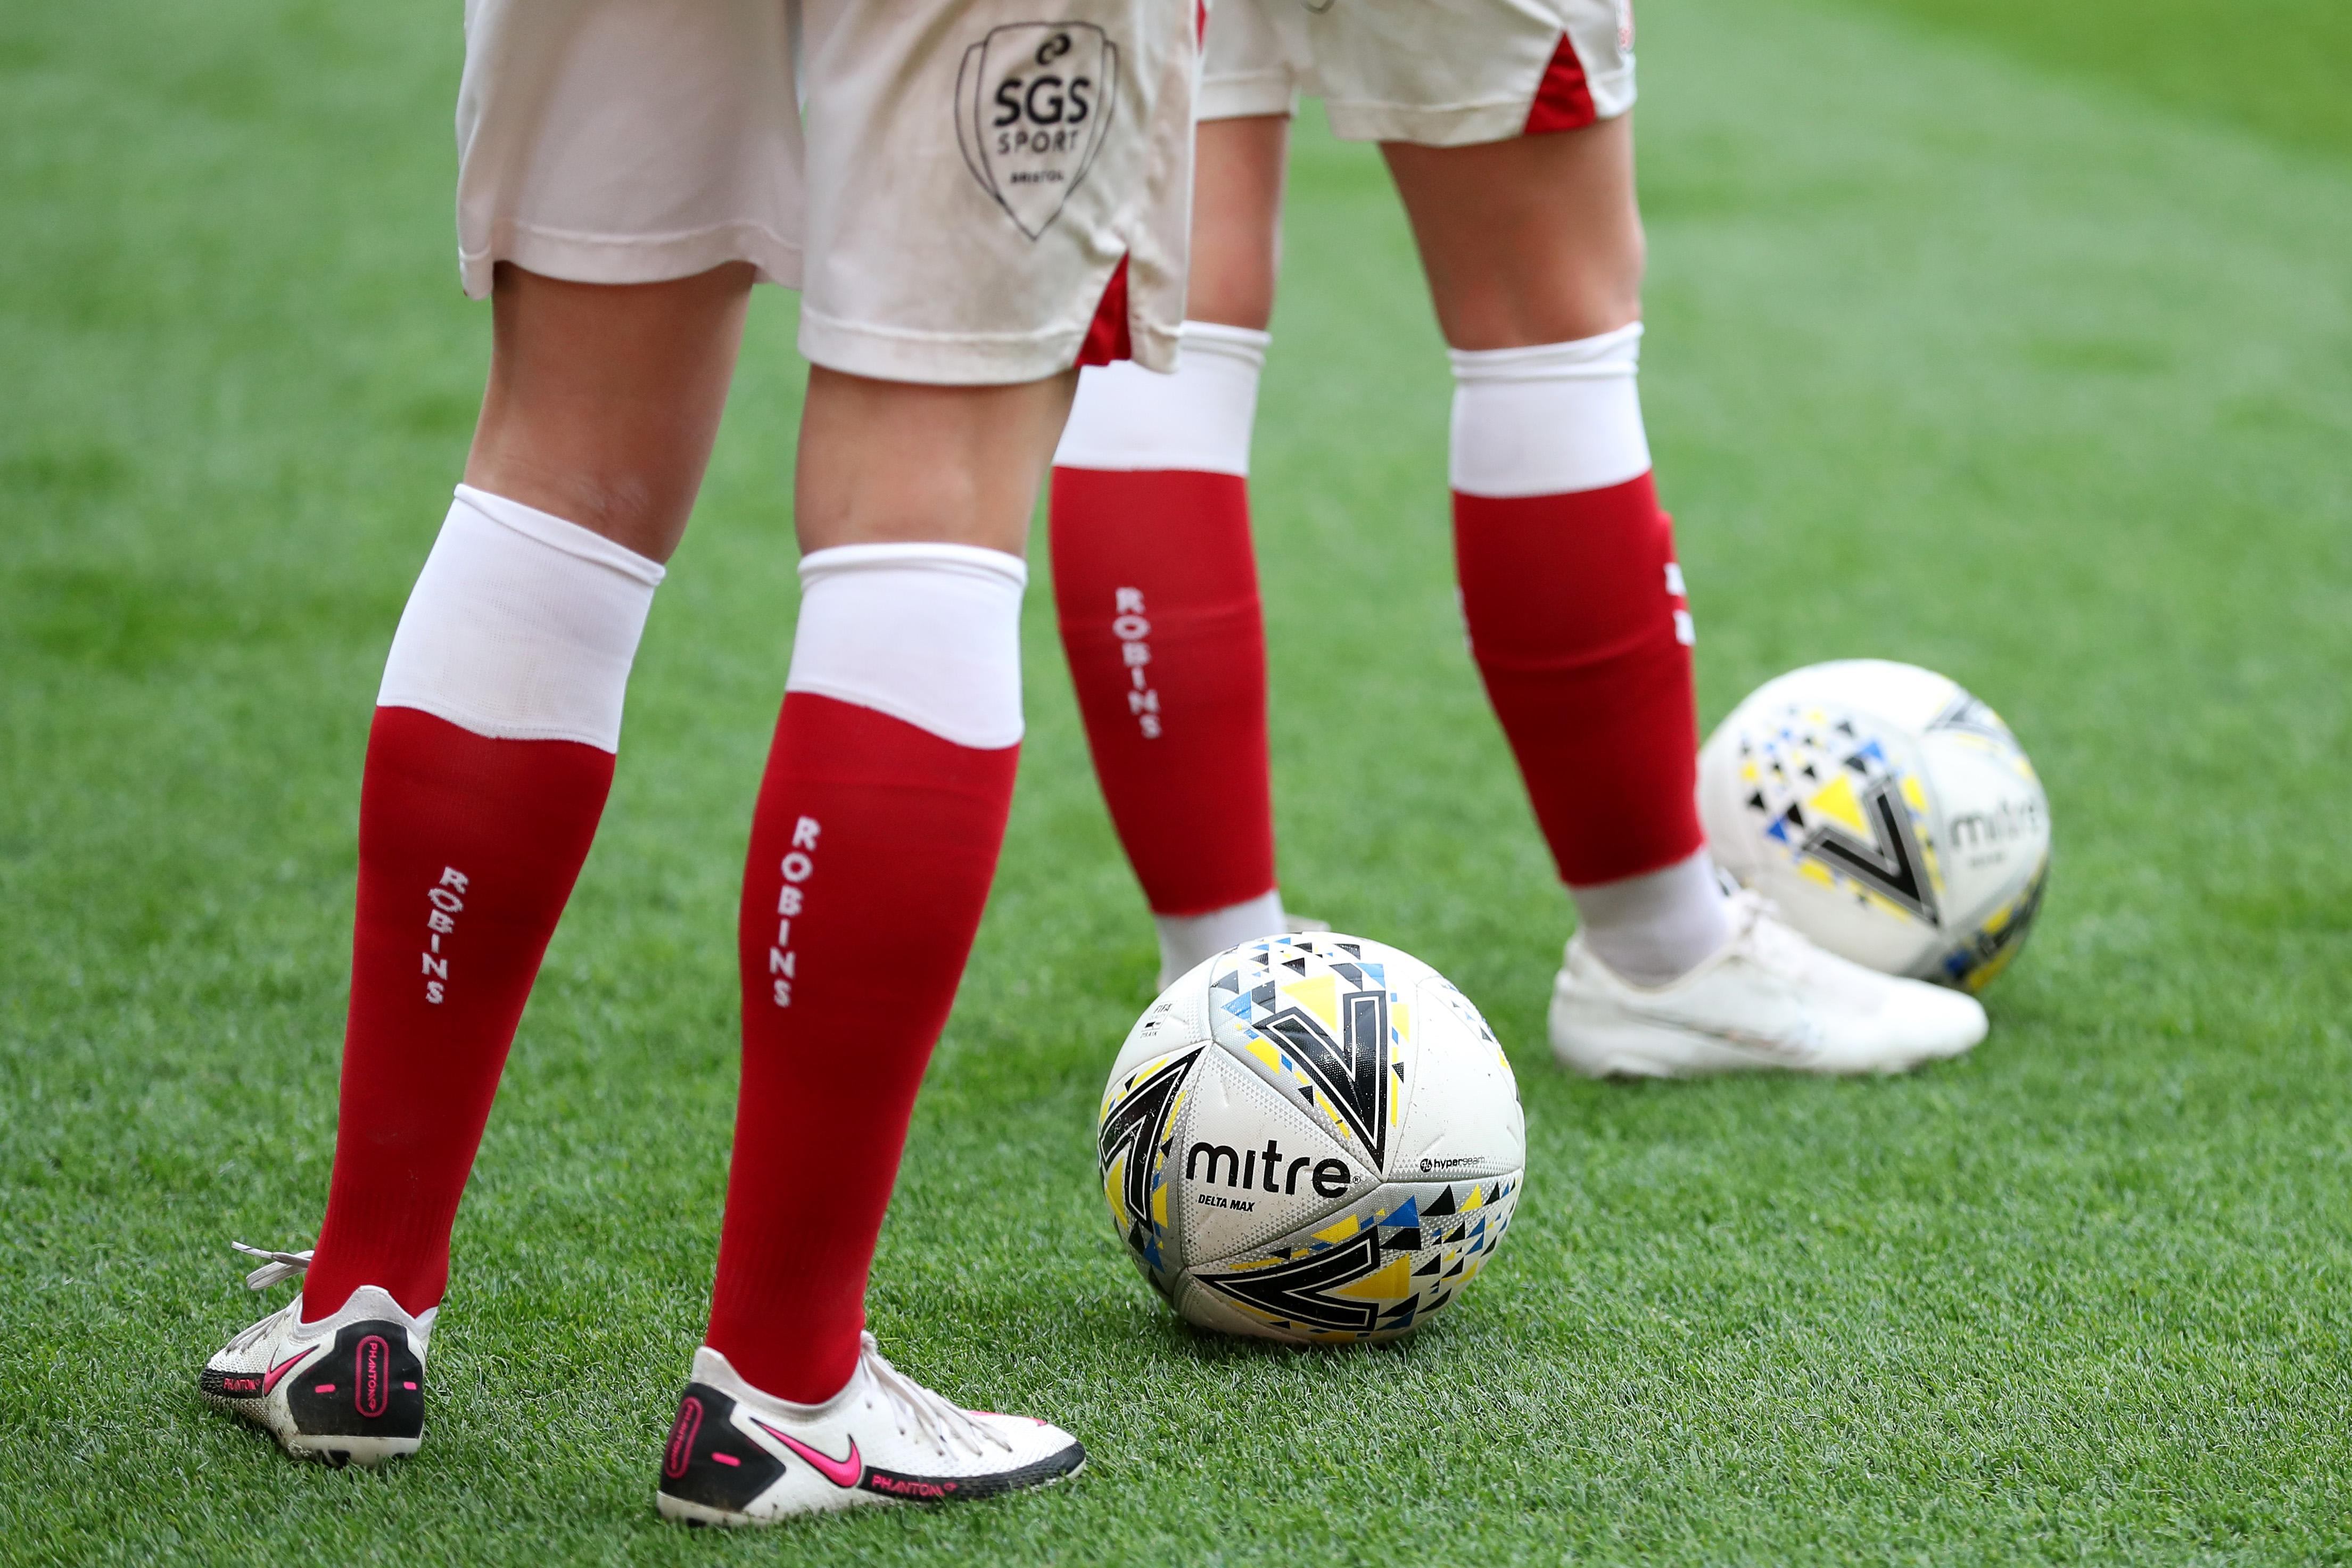 Bristol City Women v Chelsea Women - FA Women's Continental Tyres League Cup Final